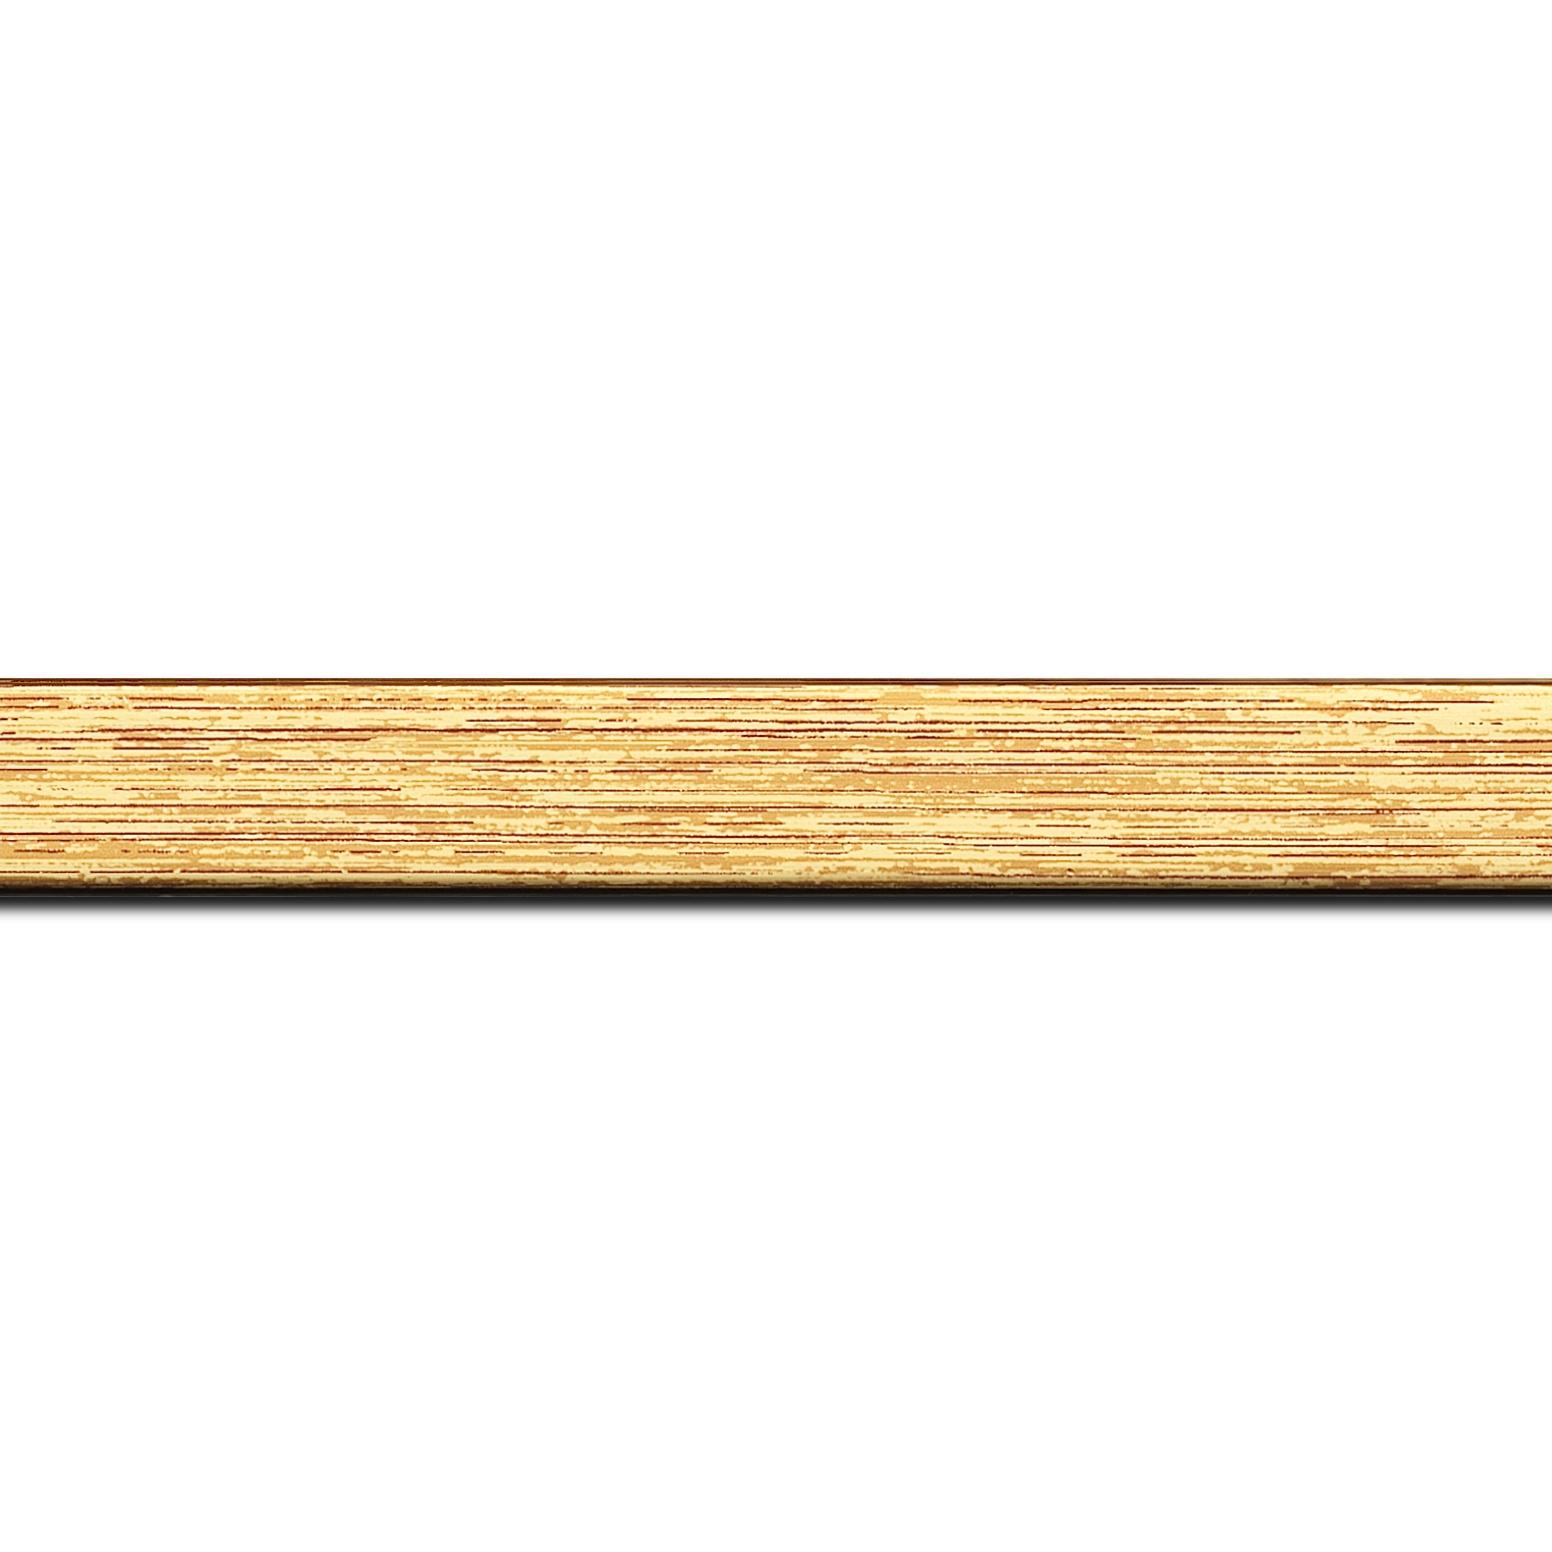 cadre bois or 20x30 pas cher cadre photo bois or 20x30 destock cadre. Black Bedroom Furniture Sets. Home Design Ideas